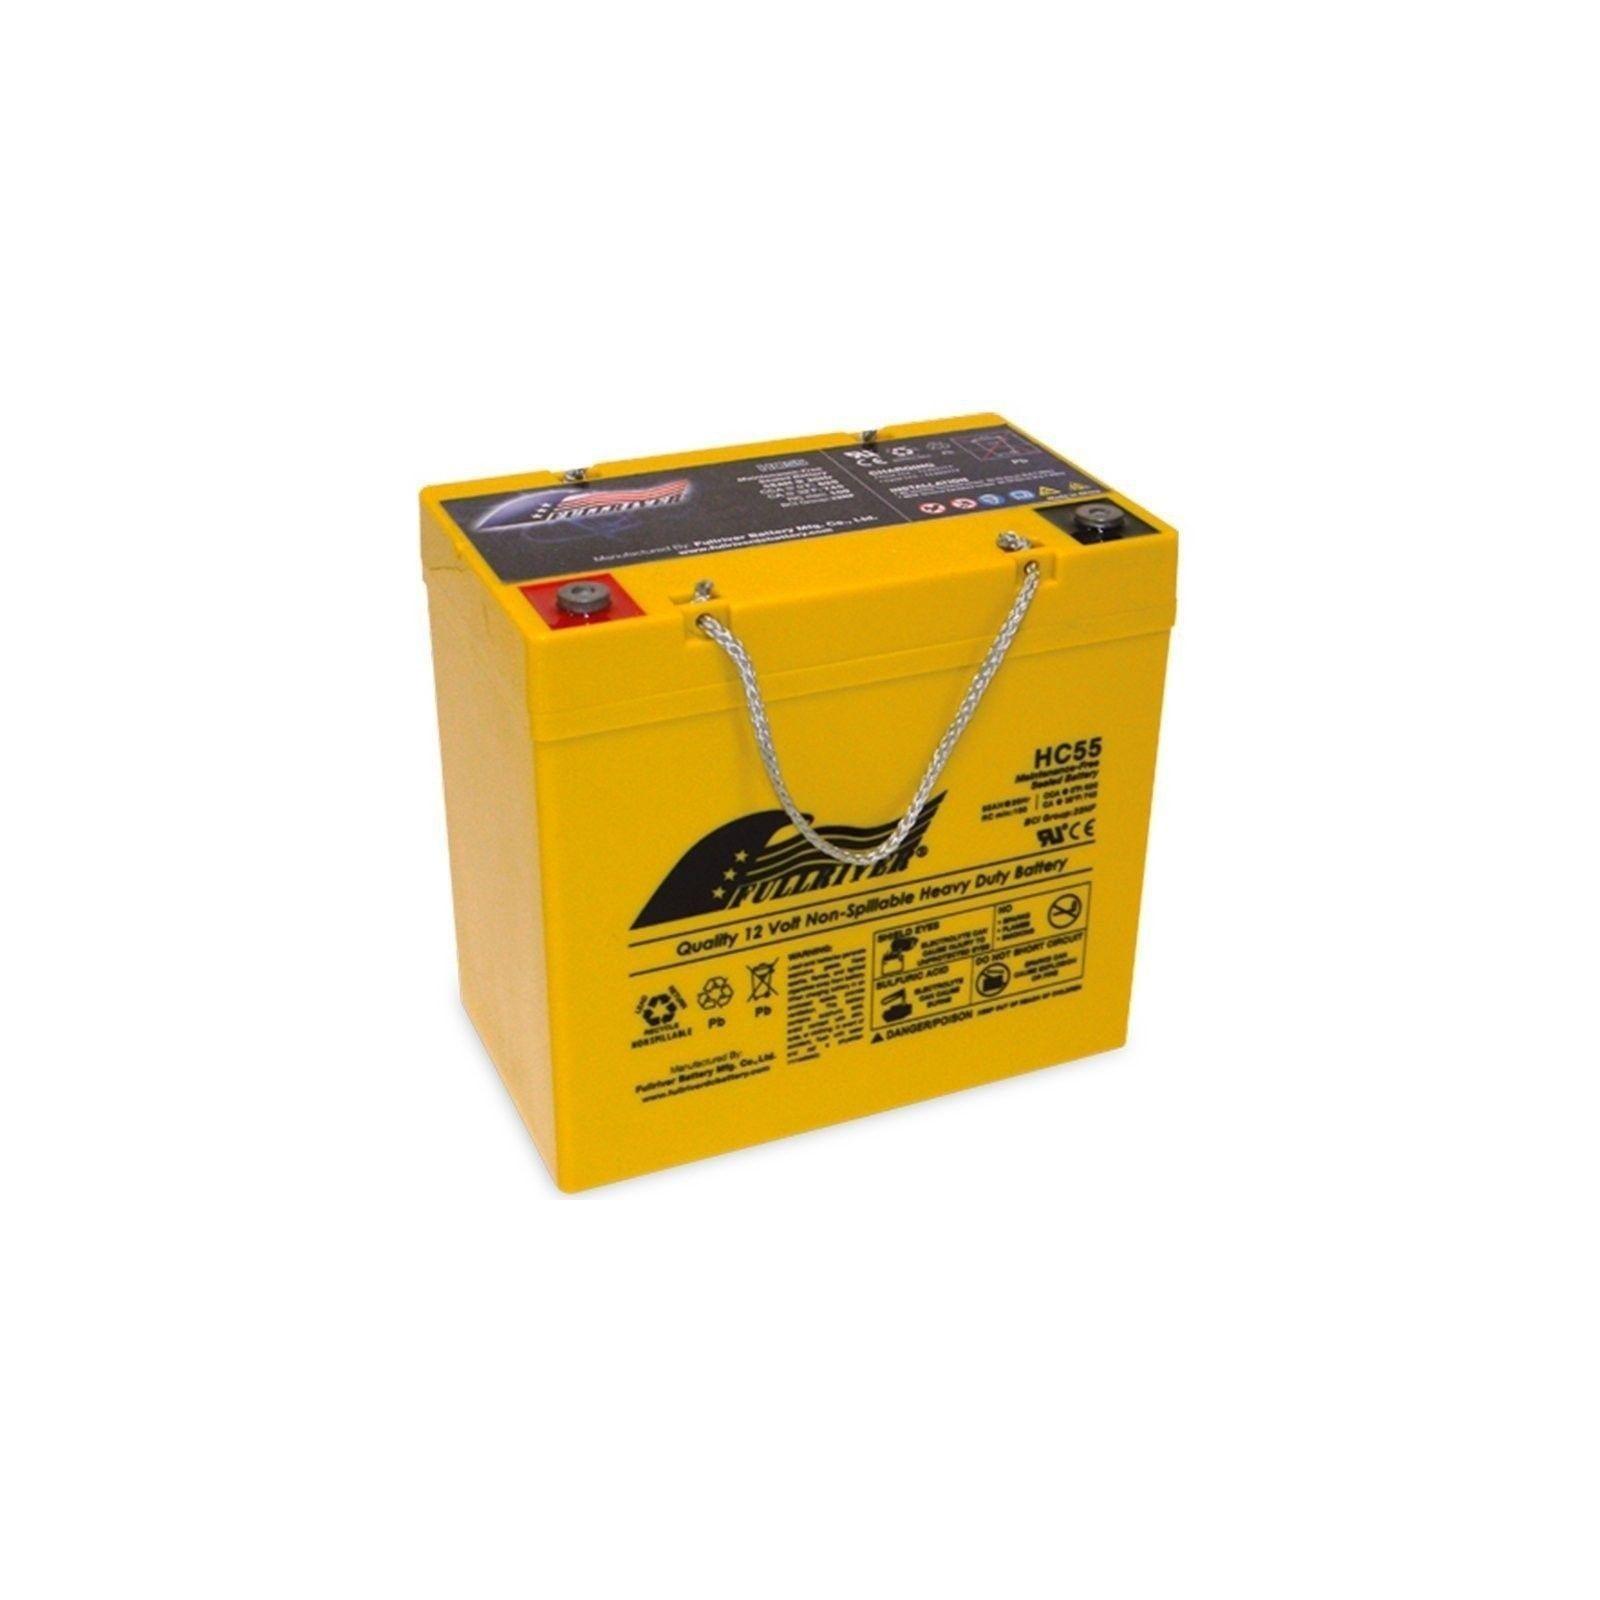 BATERIA Fullriver FULLRIVER HC55 55Ah 620A 12V FULLRIVER - 1